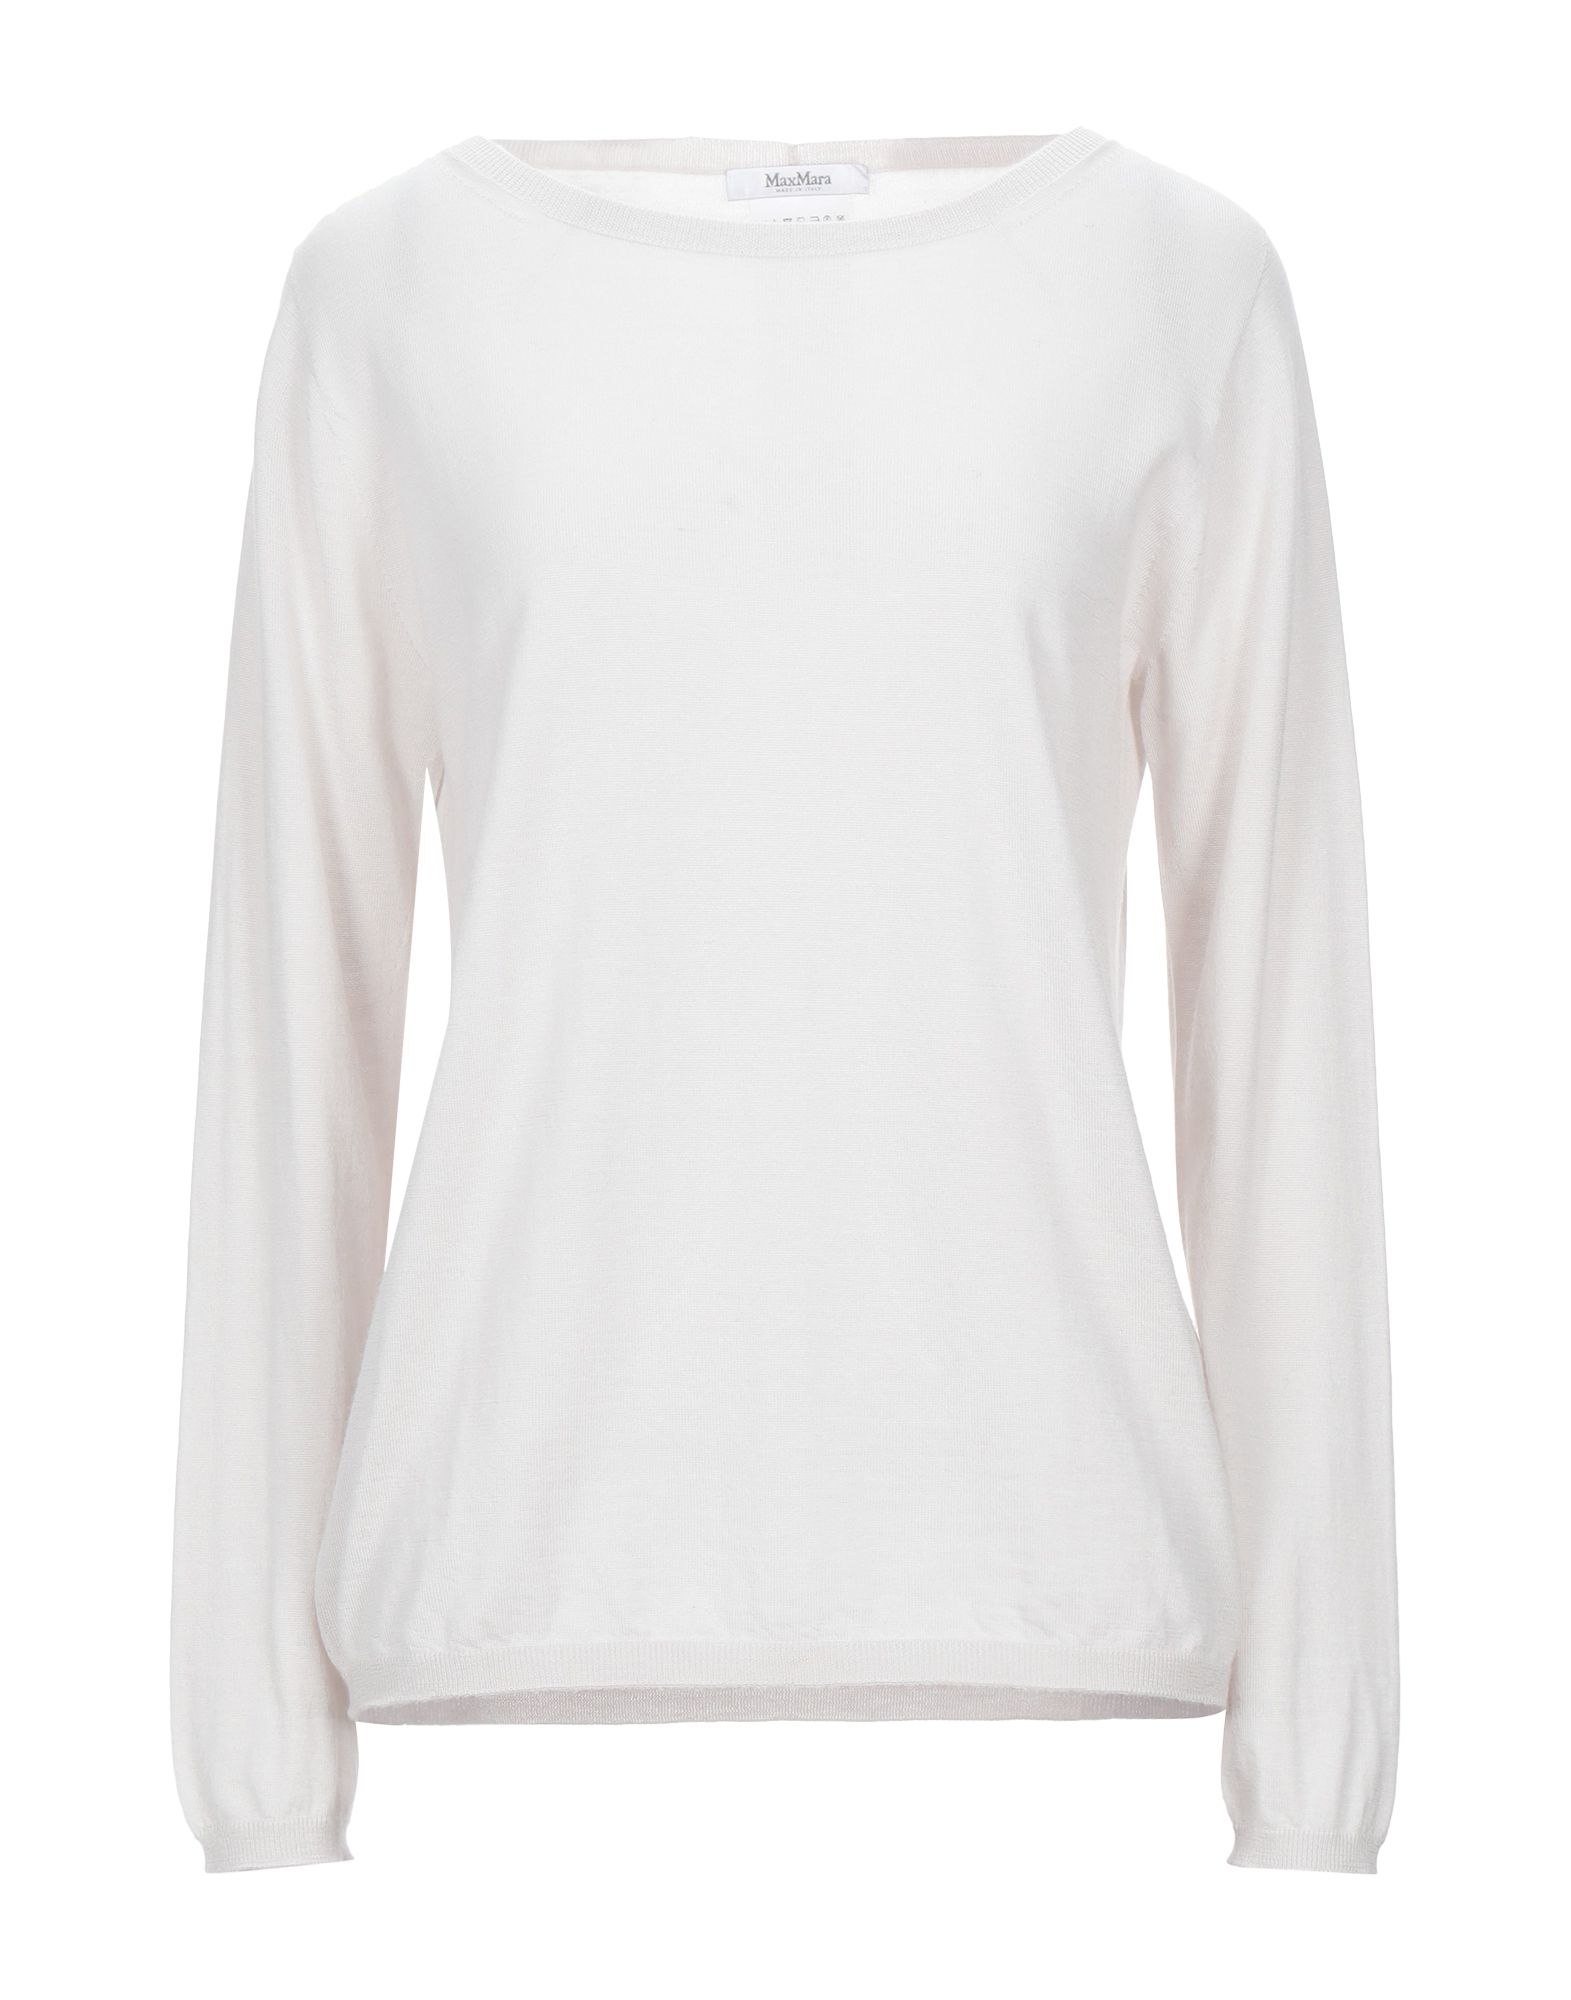 MAX MARA Sweaters - Item 39988538